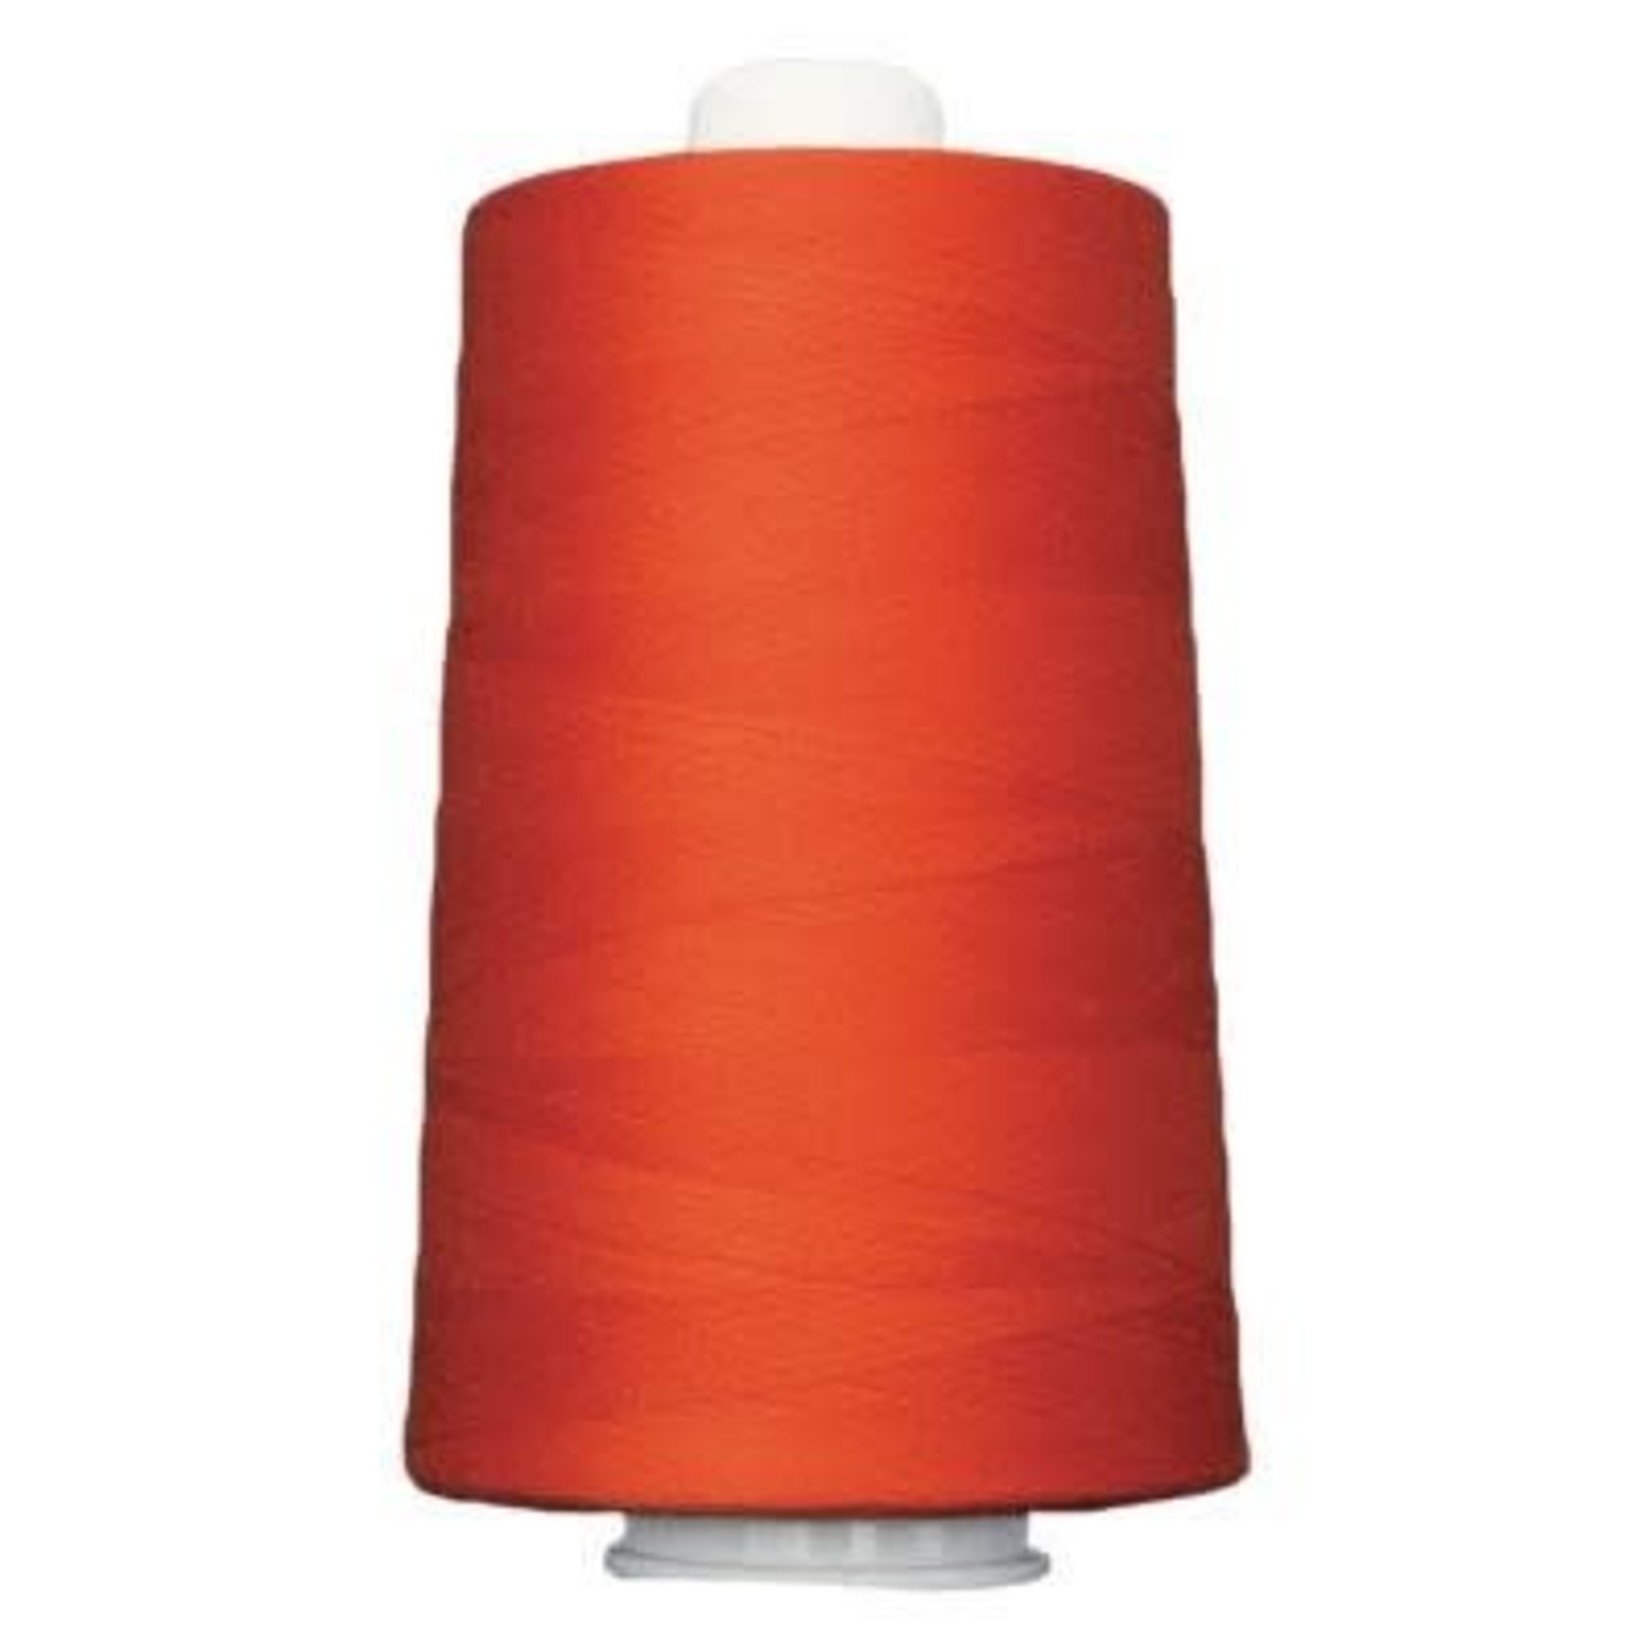 Superior Threads Omni 3155 Tangerine 6000 Yards